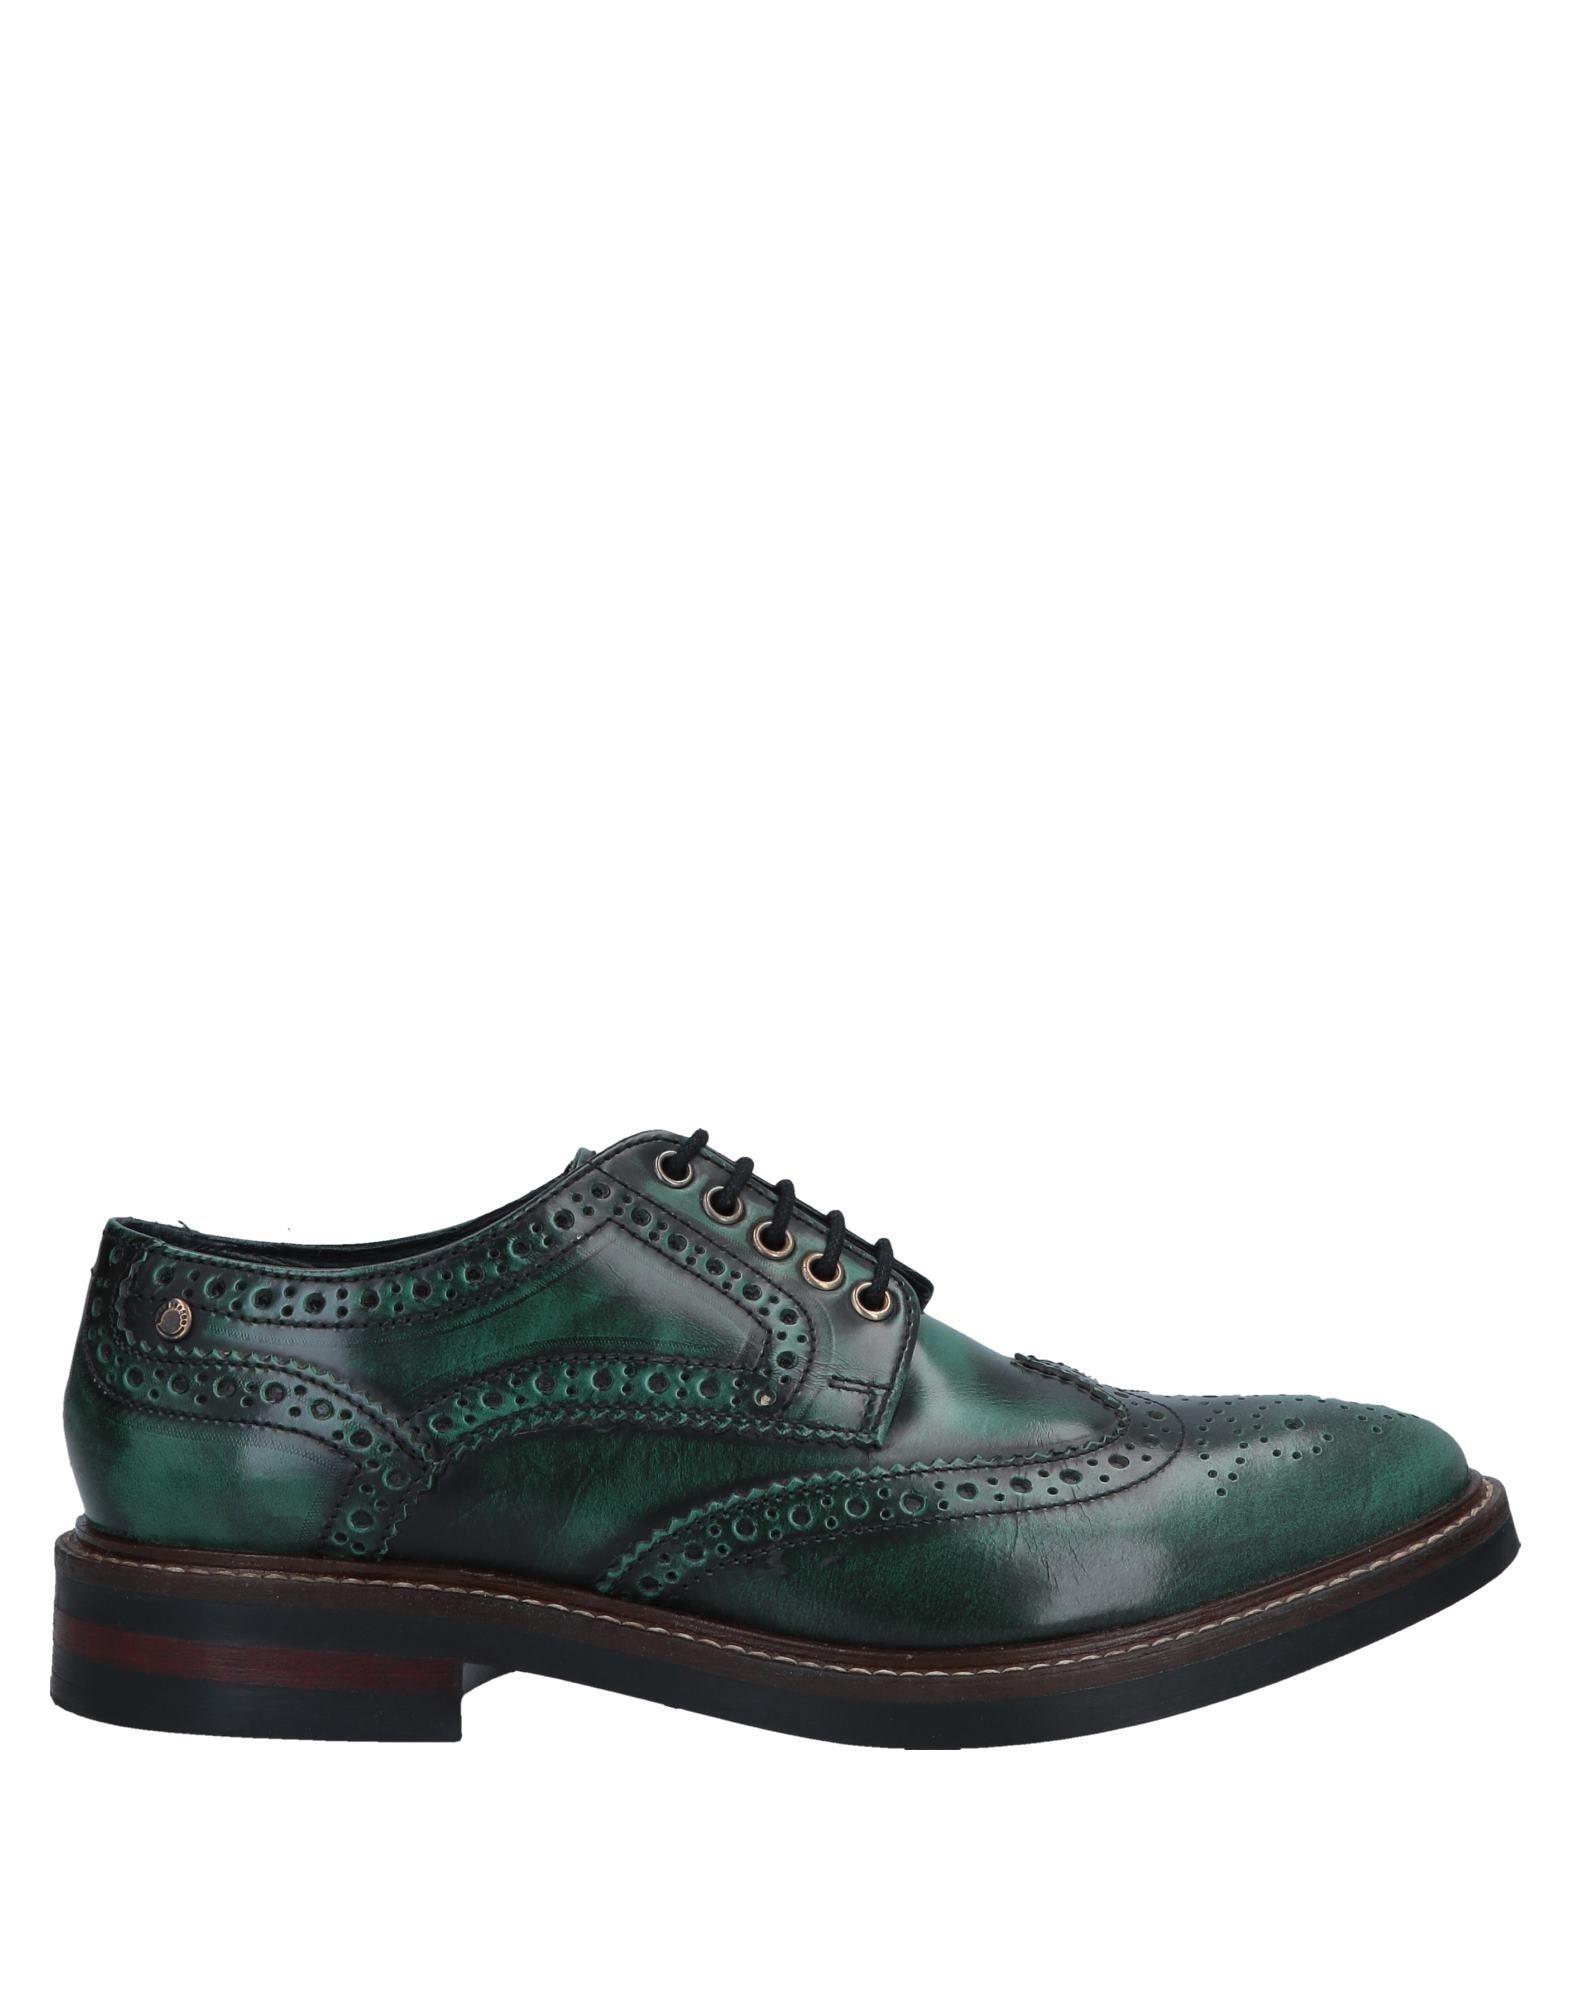 BASE London Обувь на шнурках обувь на высокой платформе buffalo london 2013